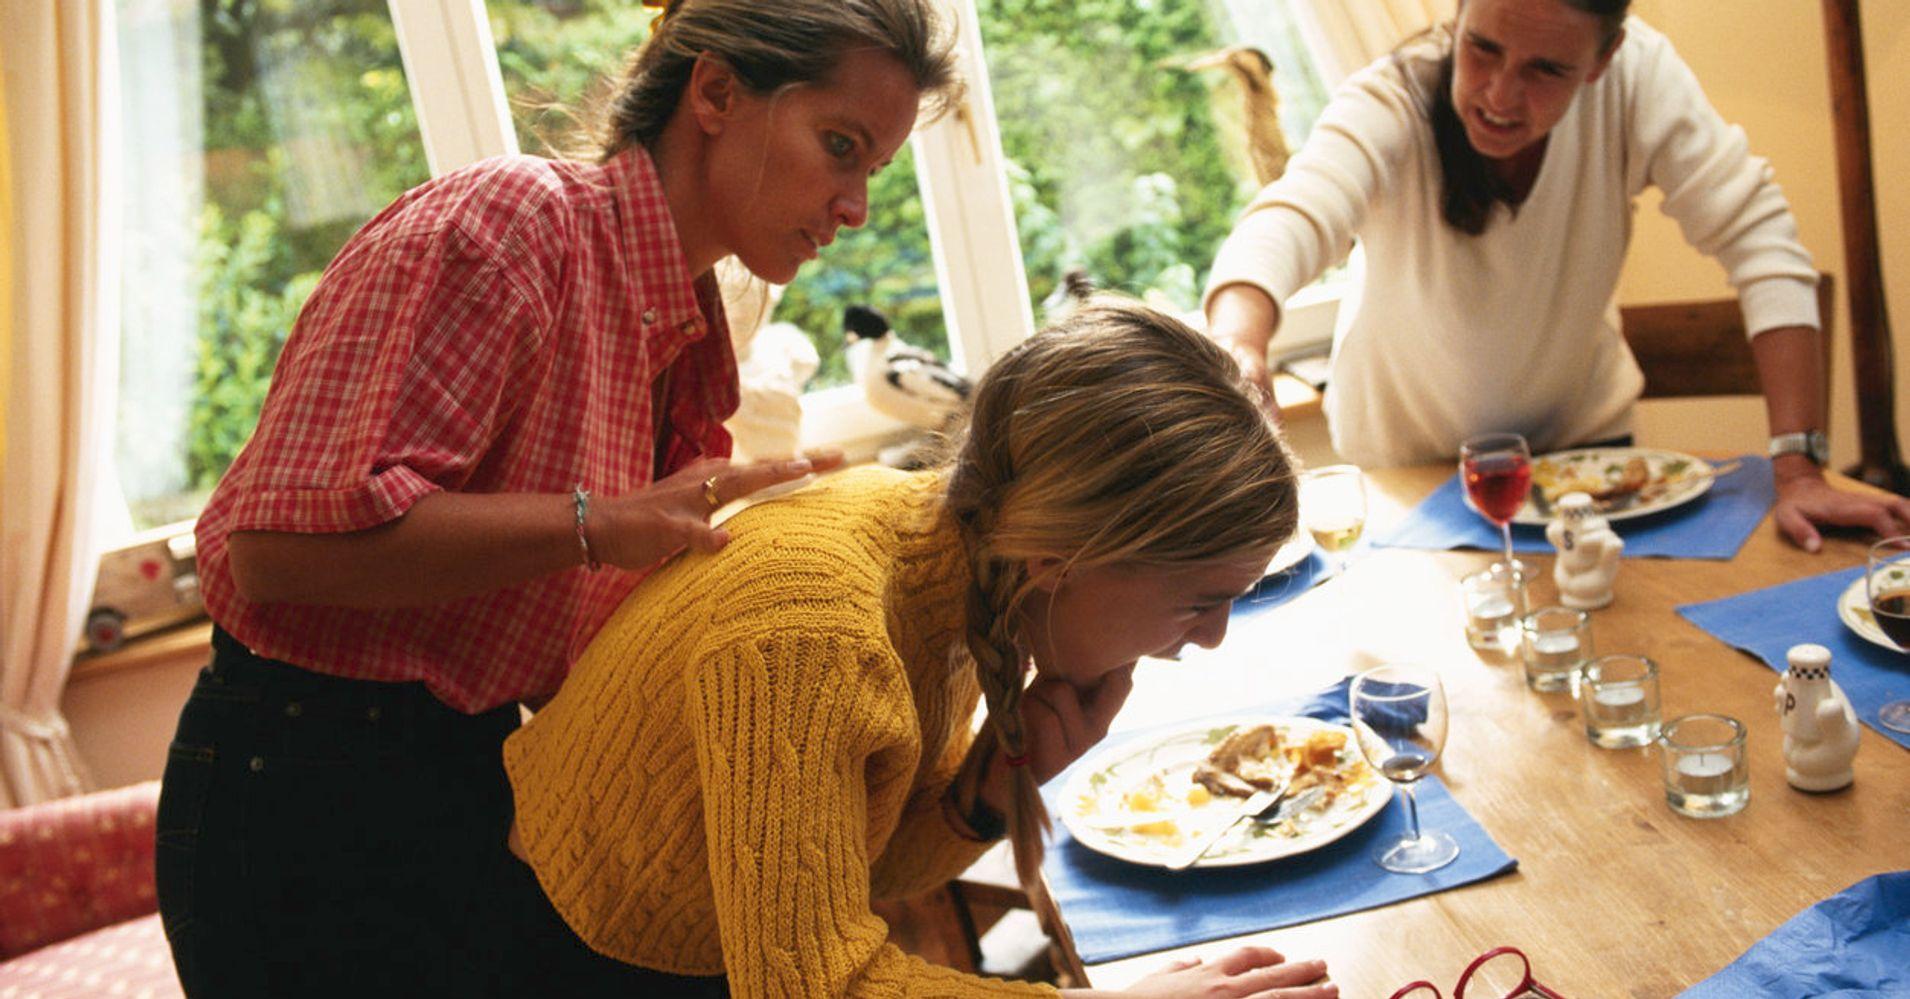 choking hazards food adults